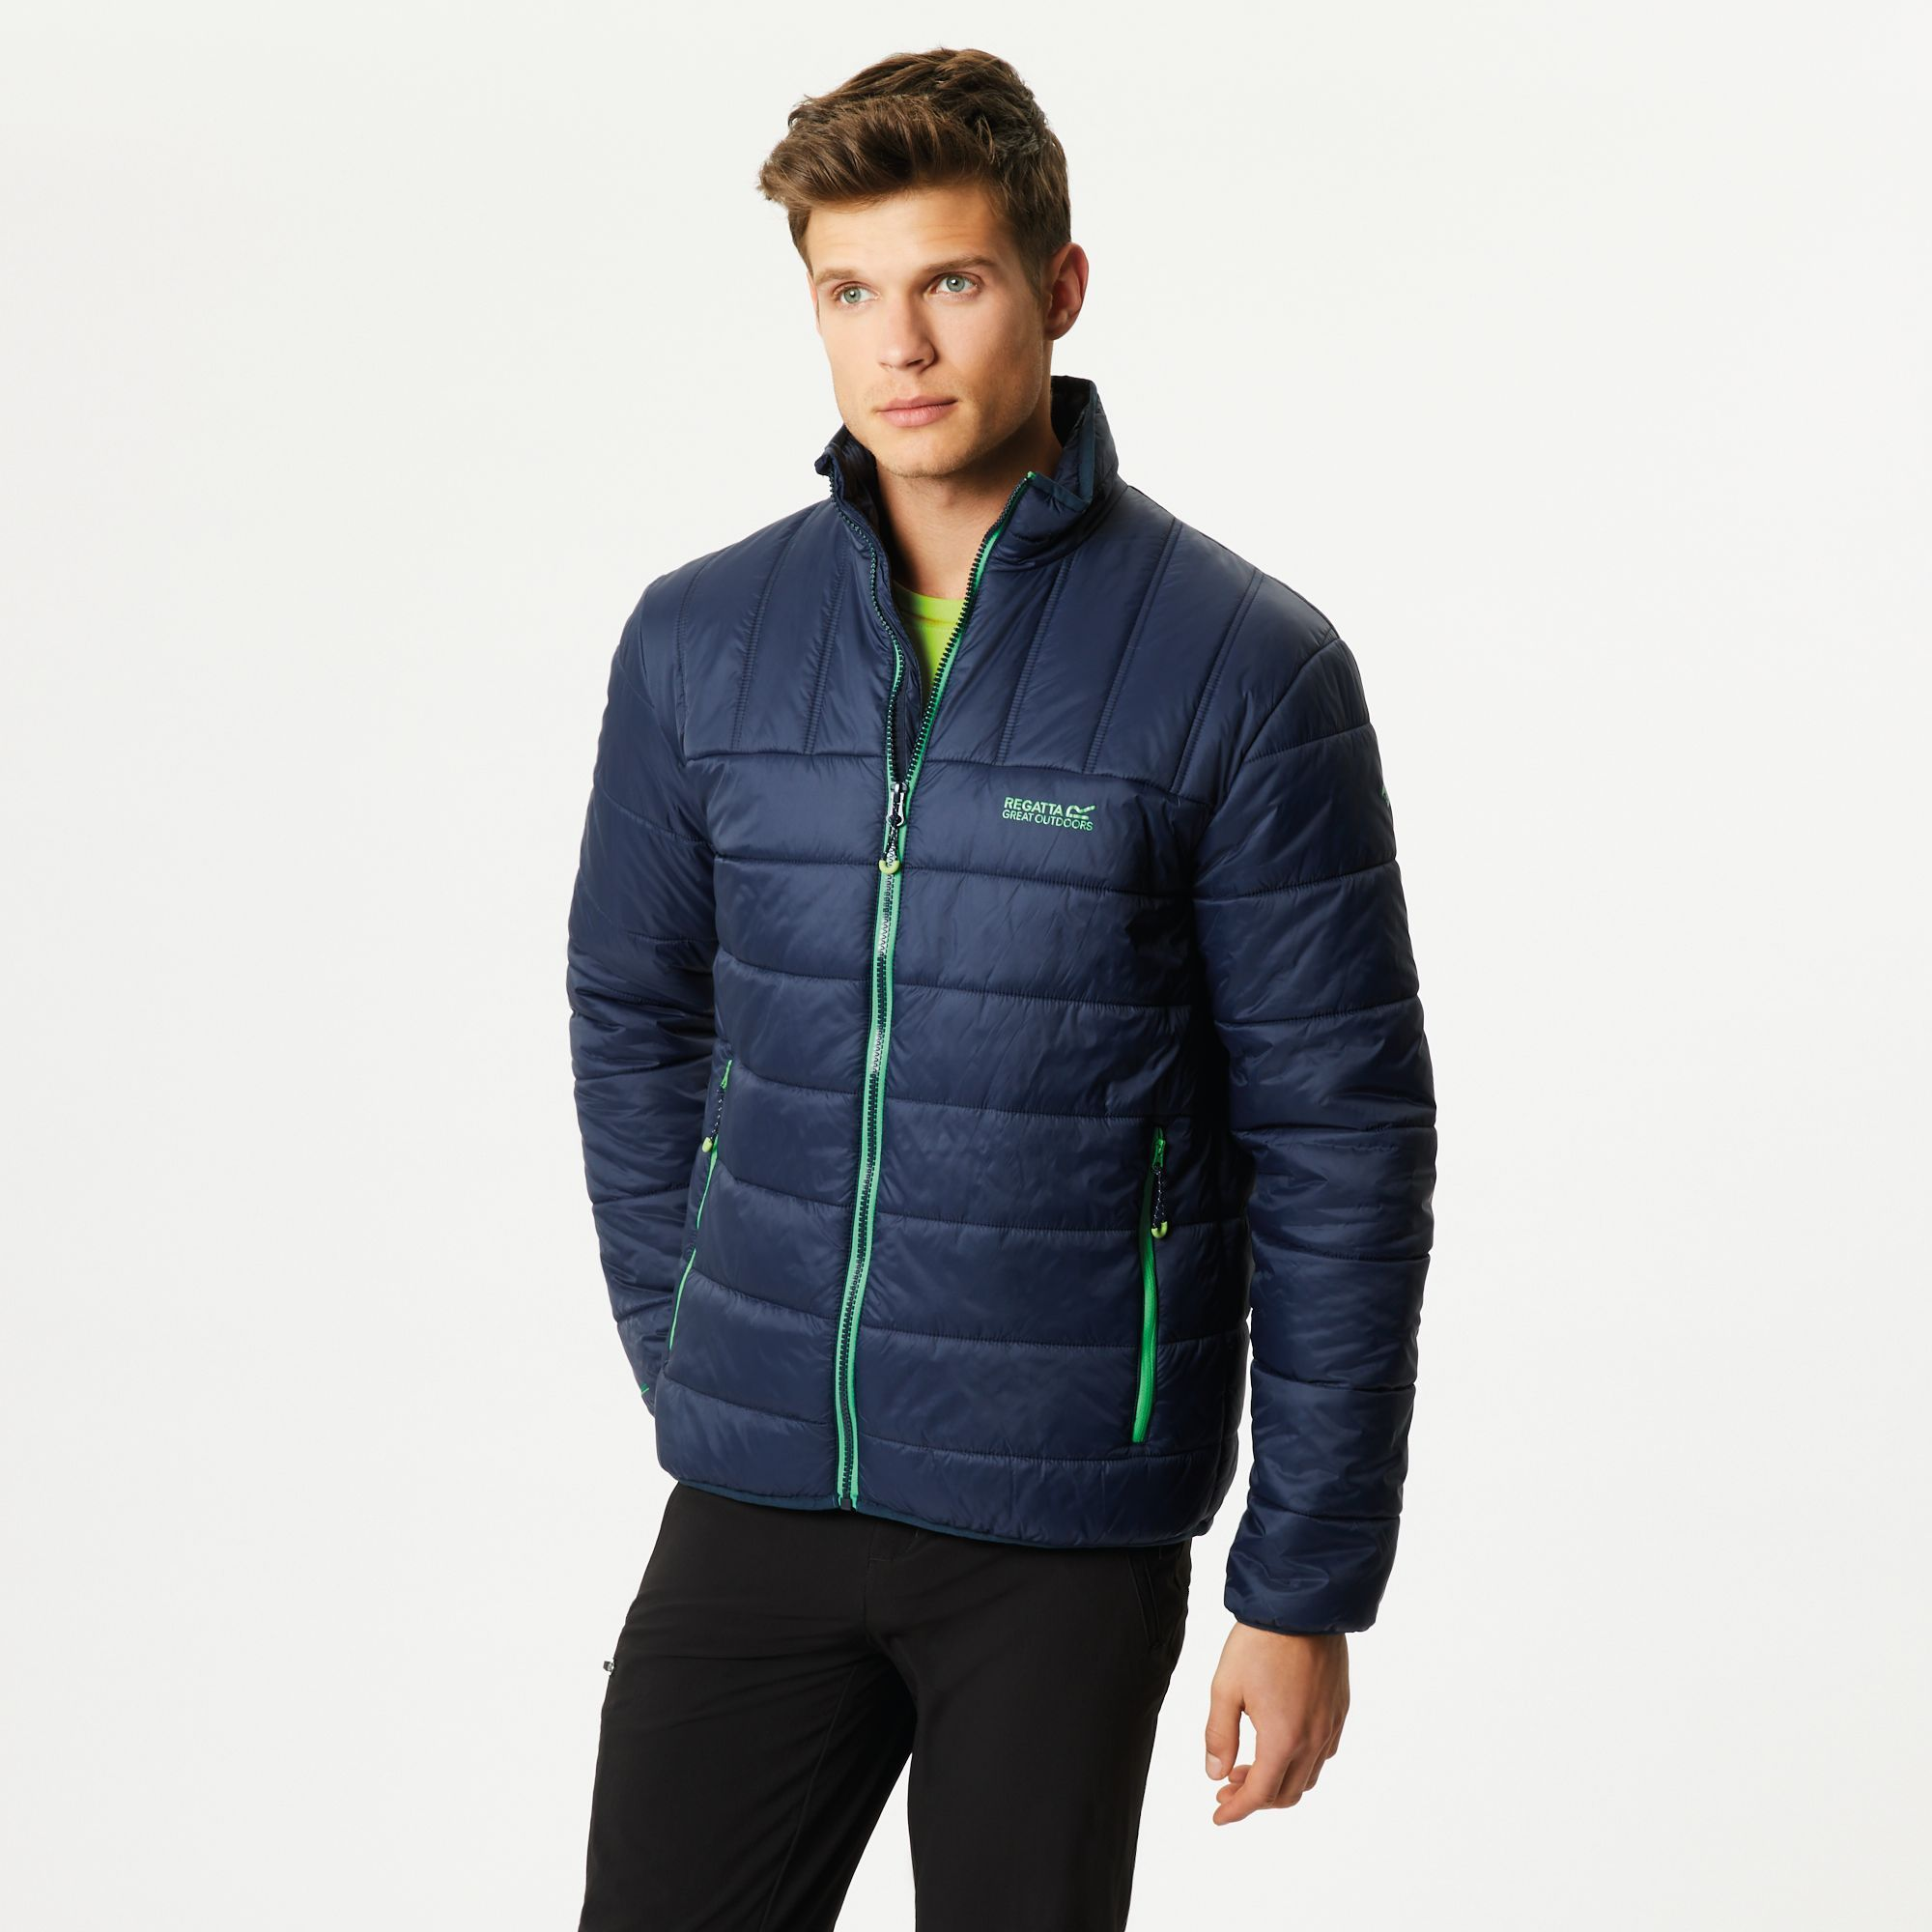 cdcbfe8f24a ... Regatta Men s Clothing    Regatta Icebound IV Mid Weight Insulated  Jacket - Navy · Rmn121 540 01 Bynder Defined Type Model 01 1538635198